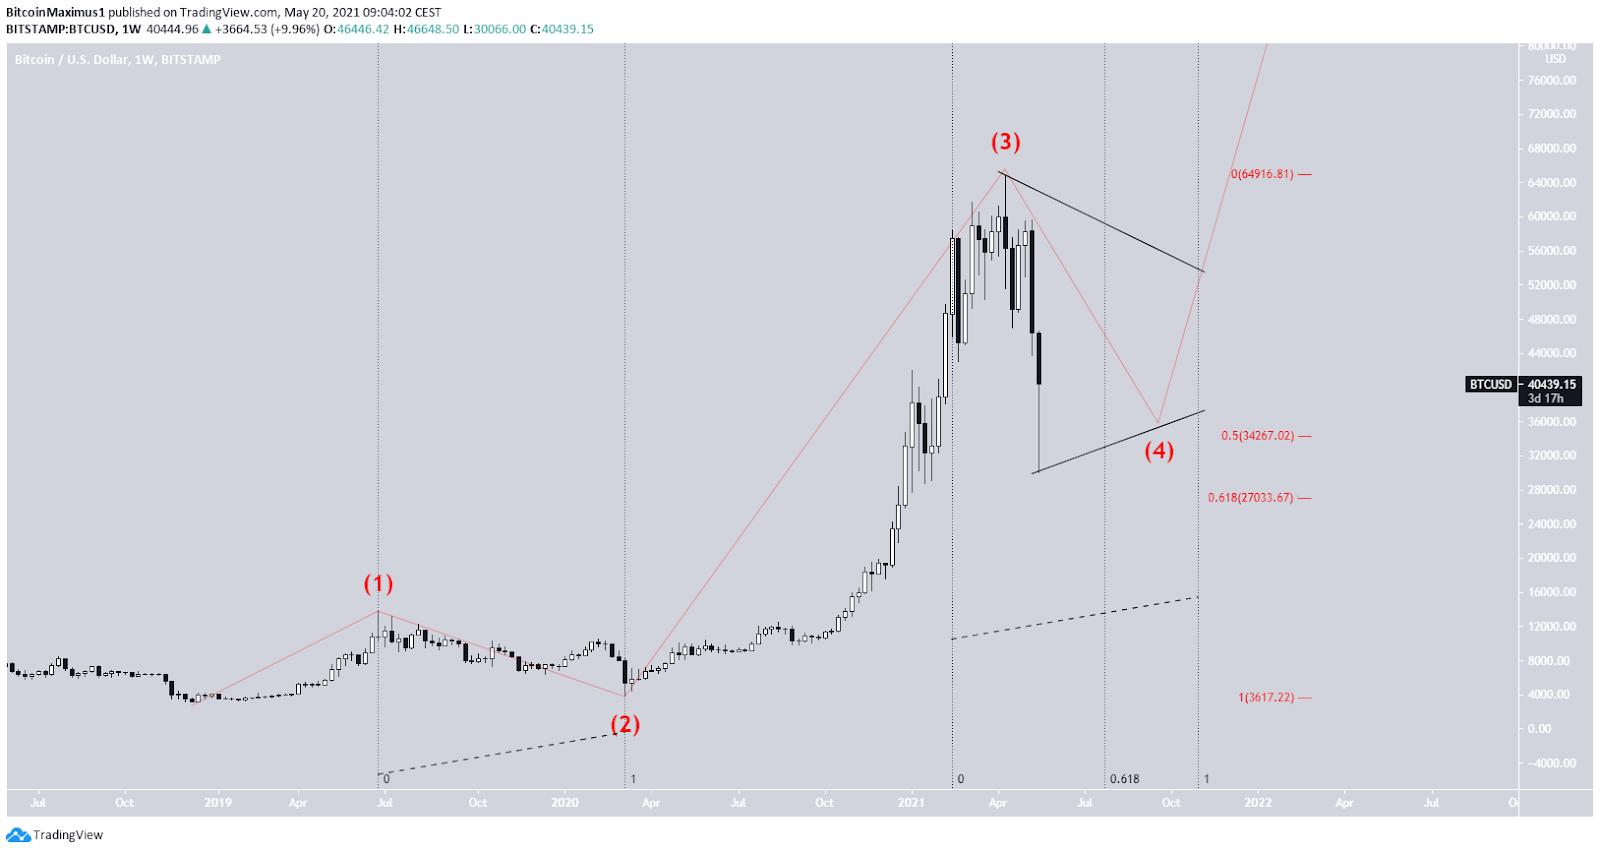 Bitcoin Kurs Preis Wellenanalyse Langzeit 20.05.2021